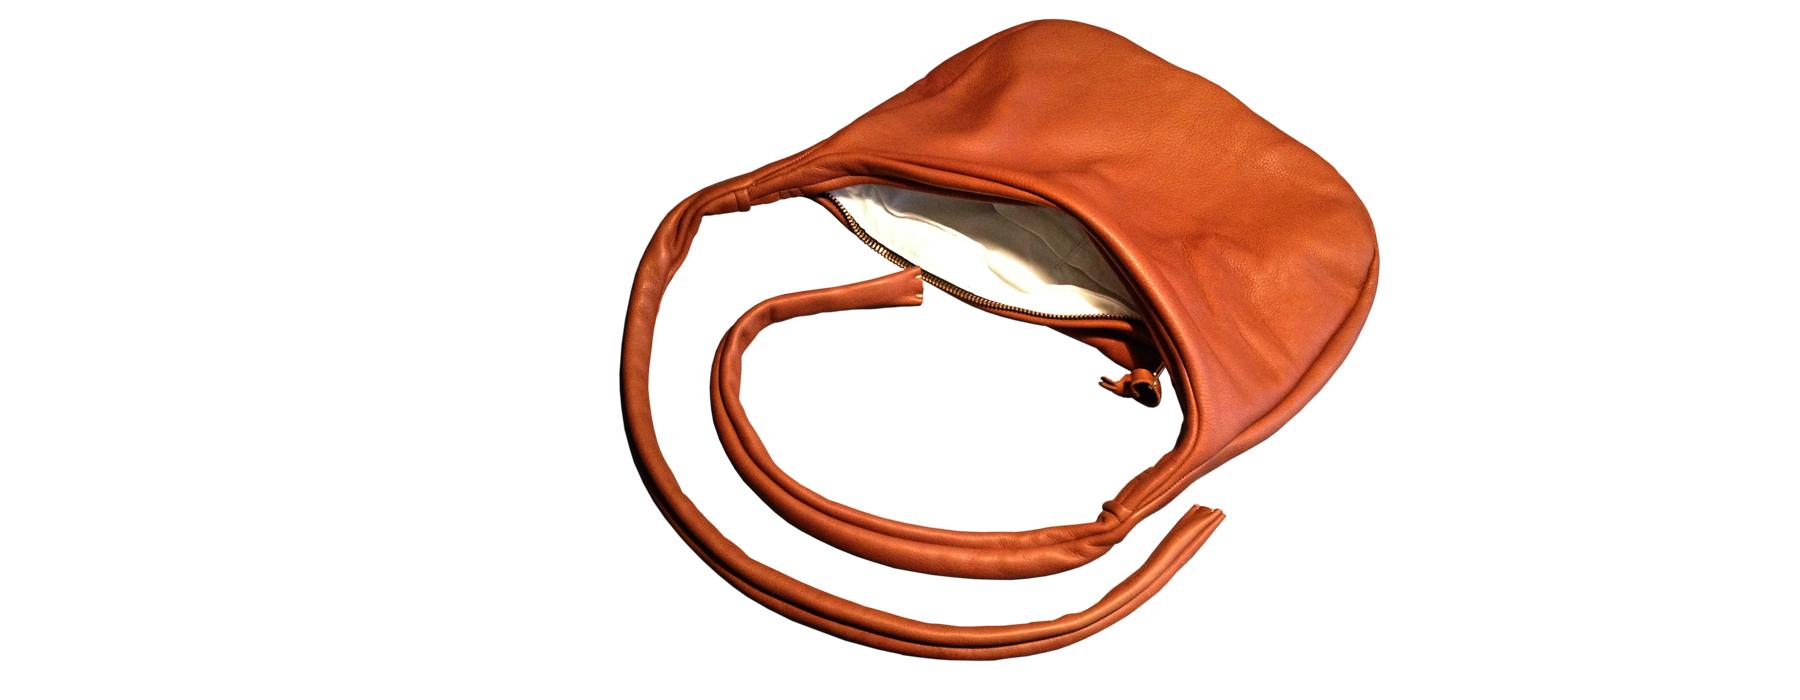 de curae | hand bag – Thorsten Schlesinger